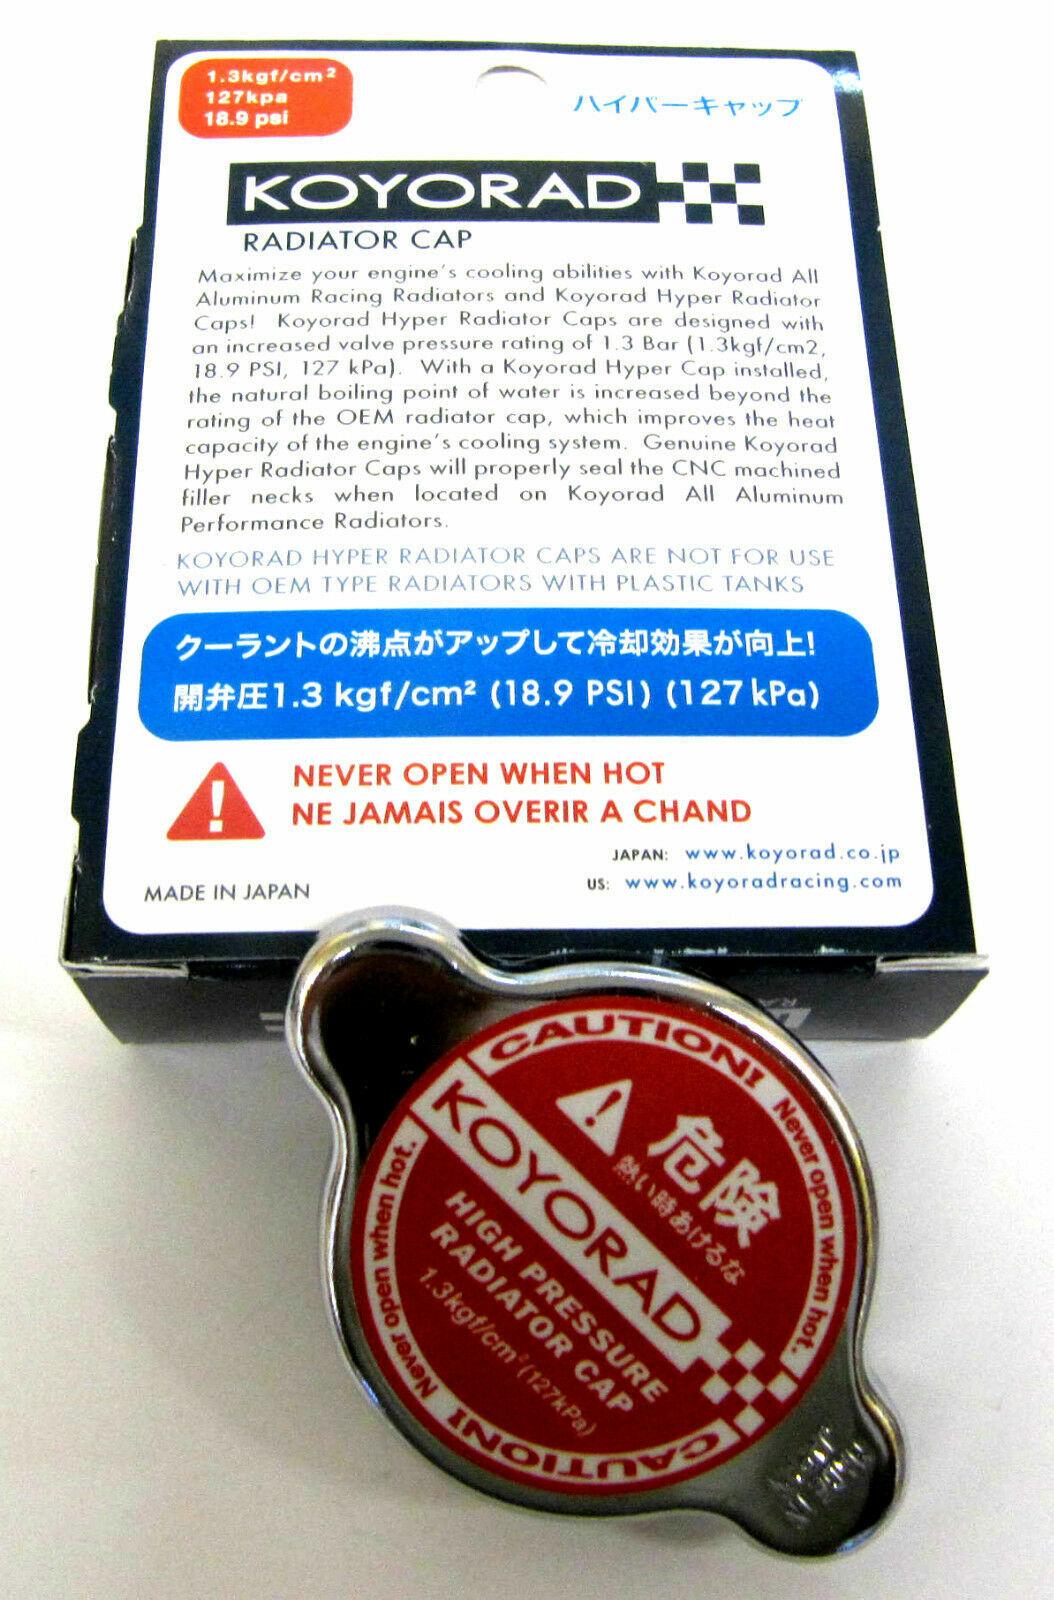 FIT ALL KOYO RADIATORS 18.85PSI KOYO RACING RADIATOR HYPER CAP SK-C13 1.3BAR